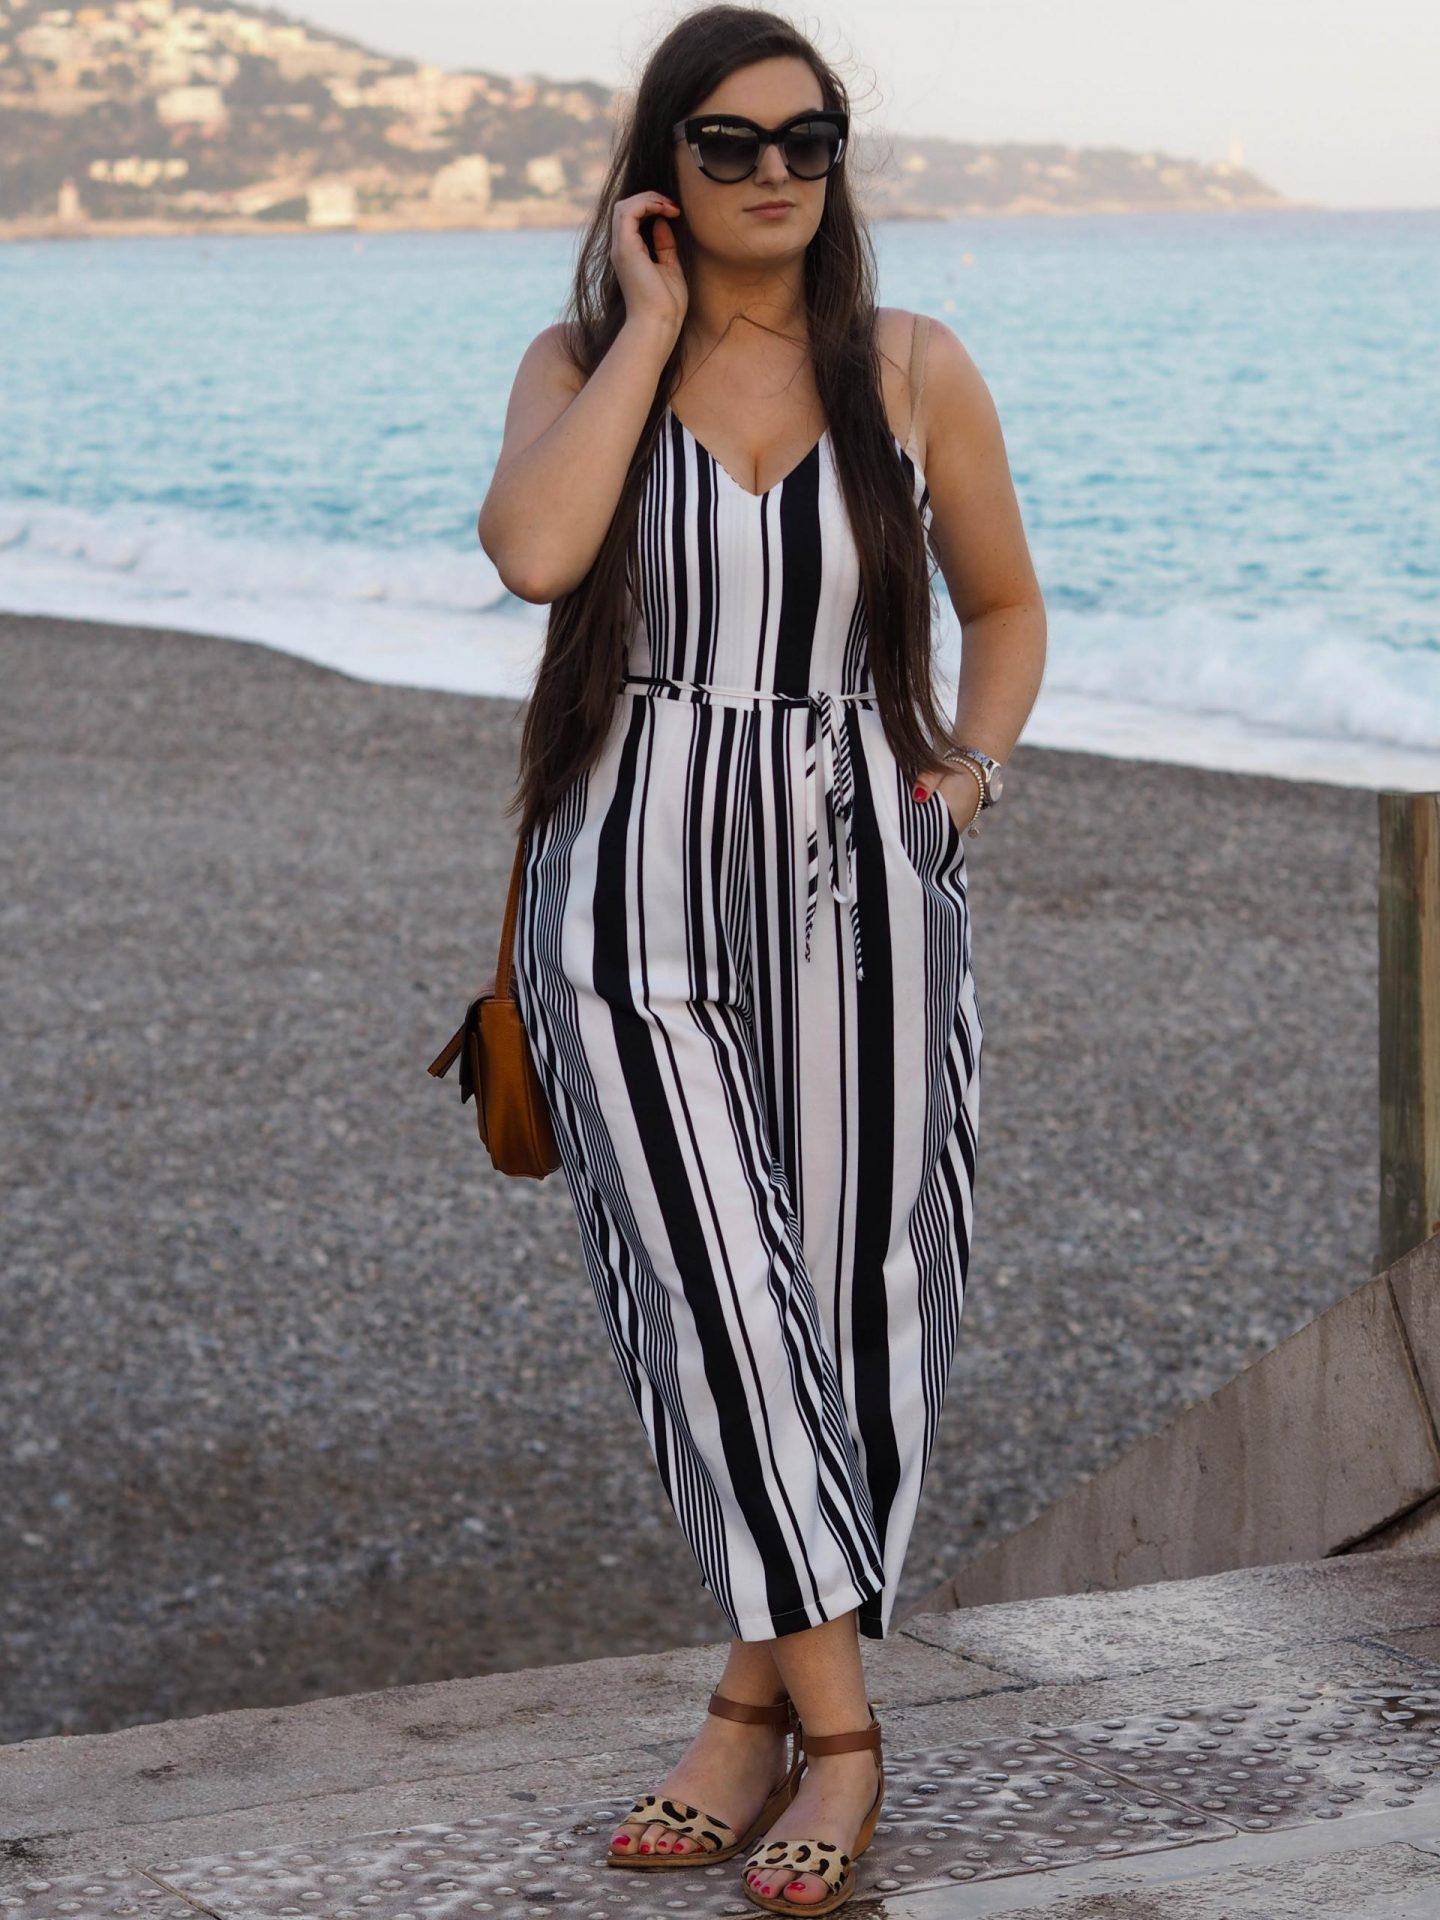 AX Striped Jumpsuit - Rachel Nicole UK Fashion Blogger 4